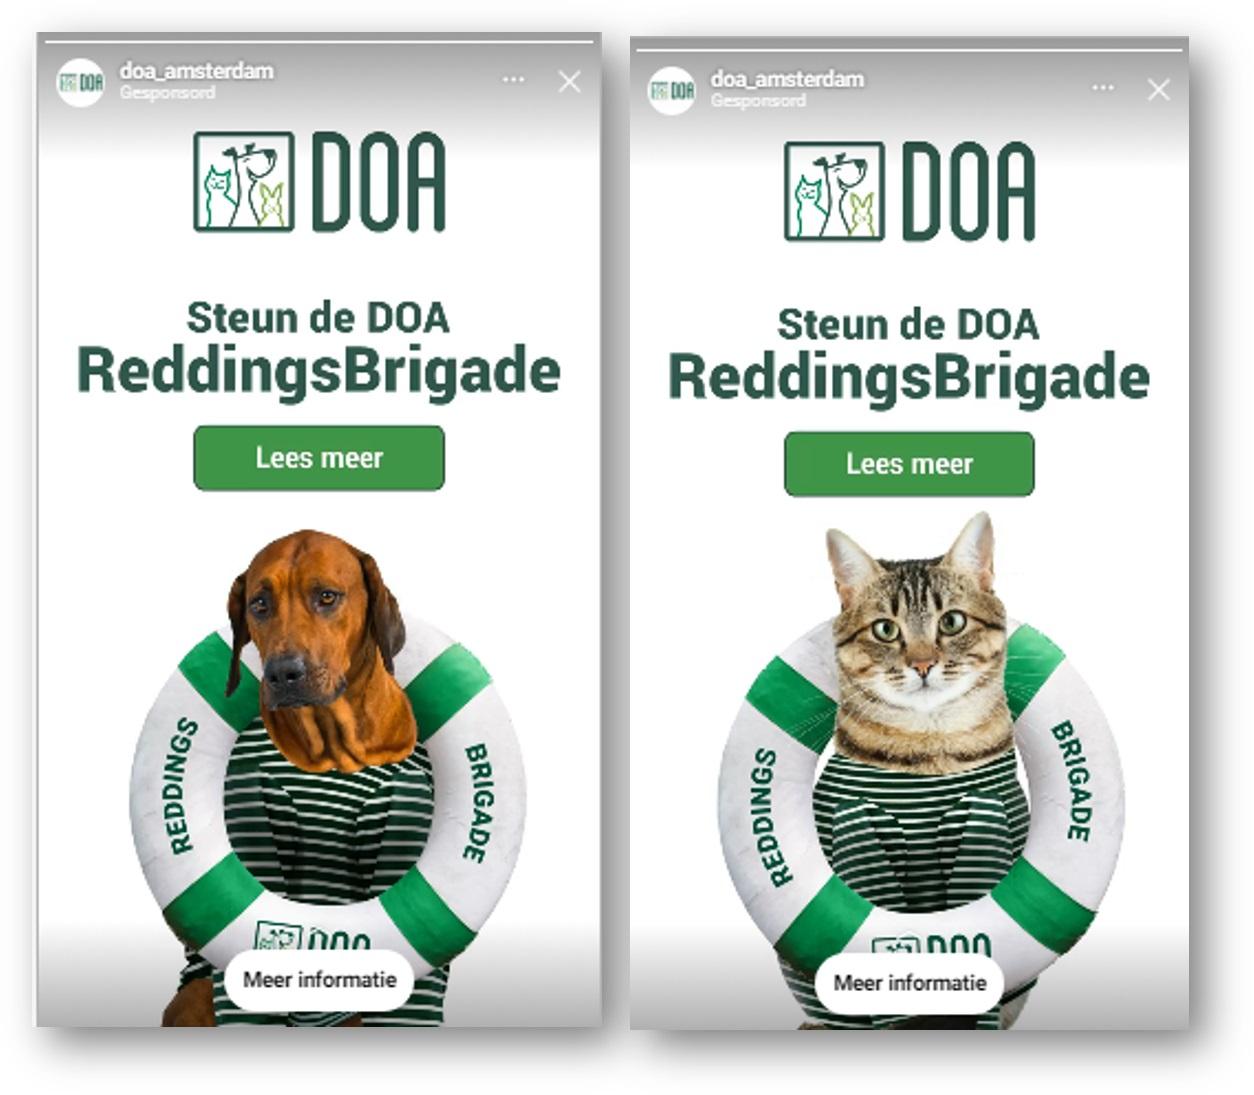 Campagne: de Reddingsbrigade van DOA